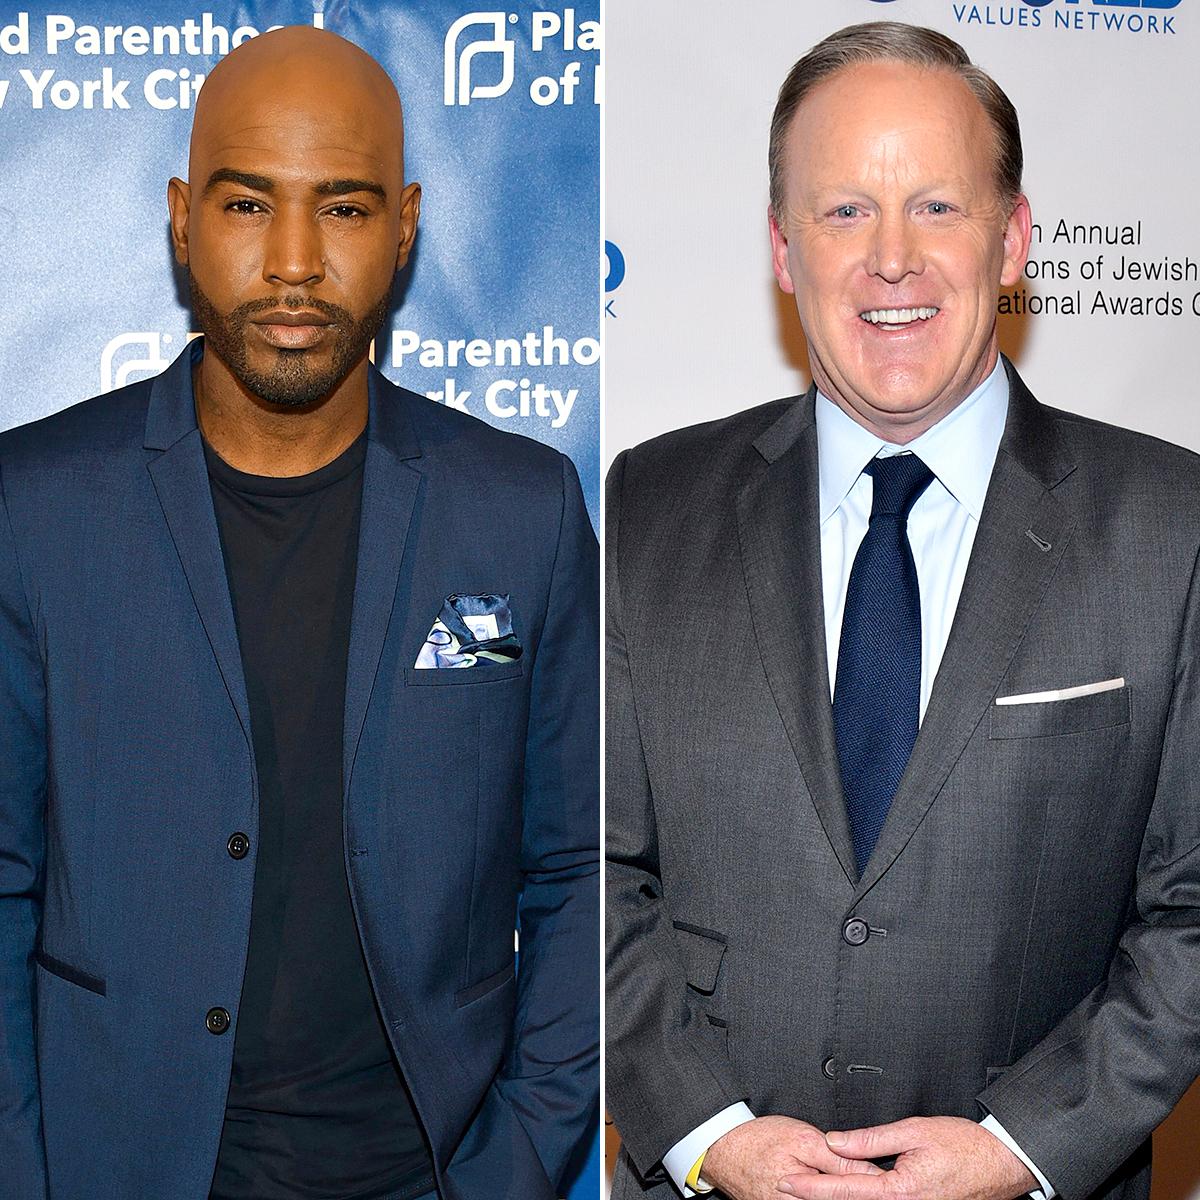 Karamo Brown Responds to Backlash After Calling Sean Spicer a 'Good Guy'